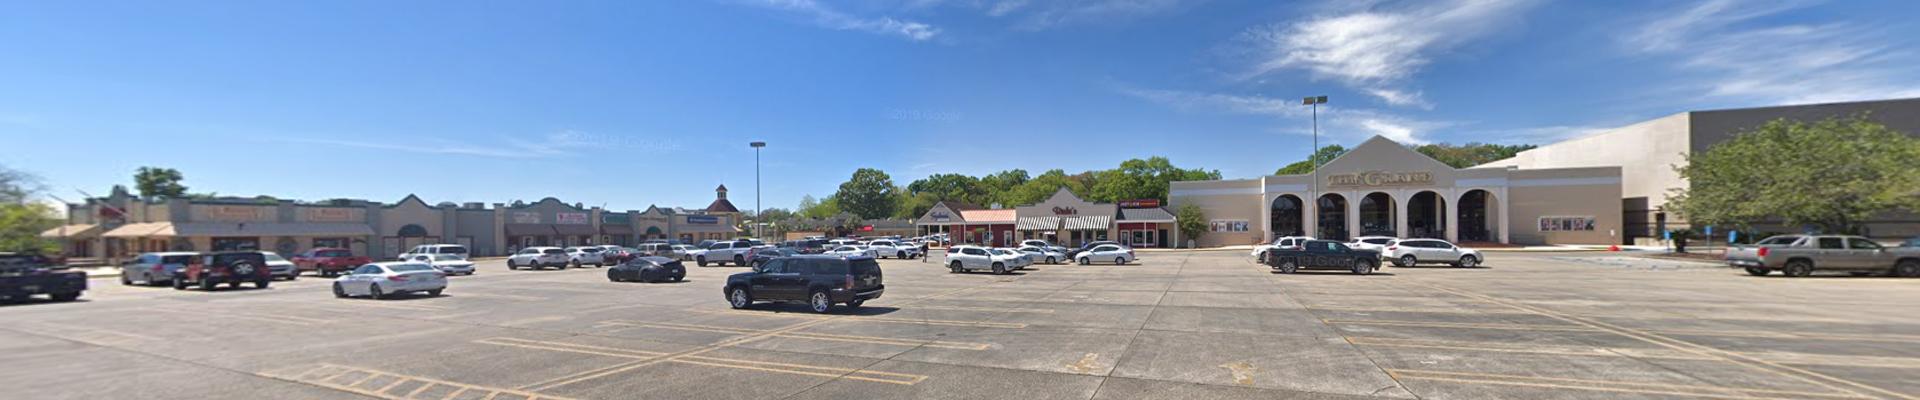 Bayou Landing Shopping Center – New Iberia